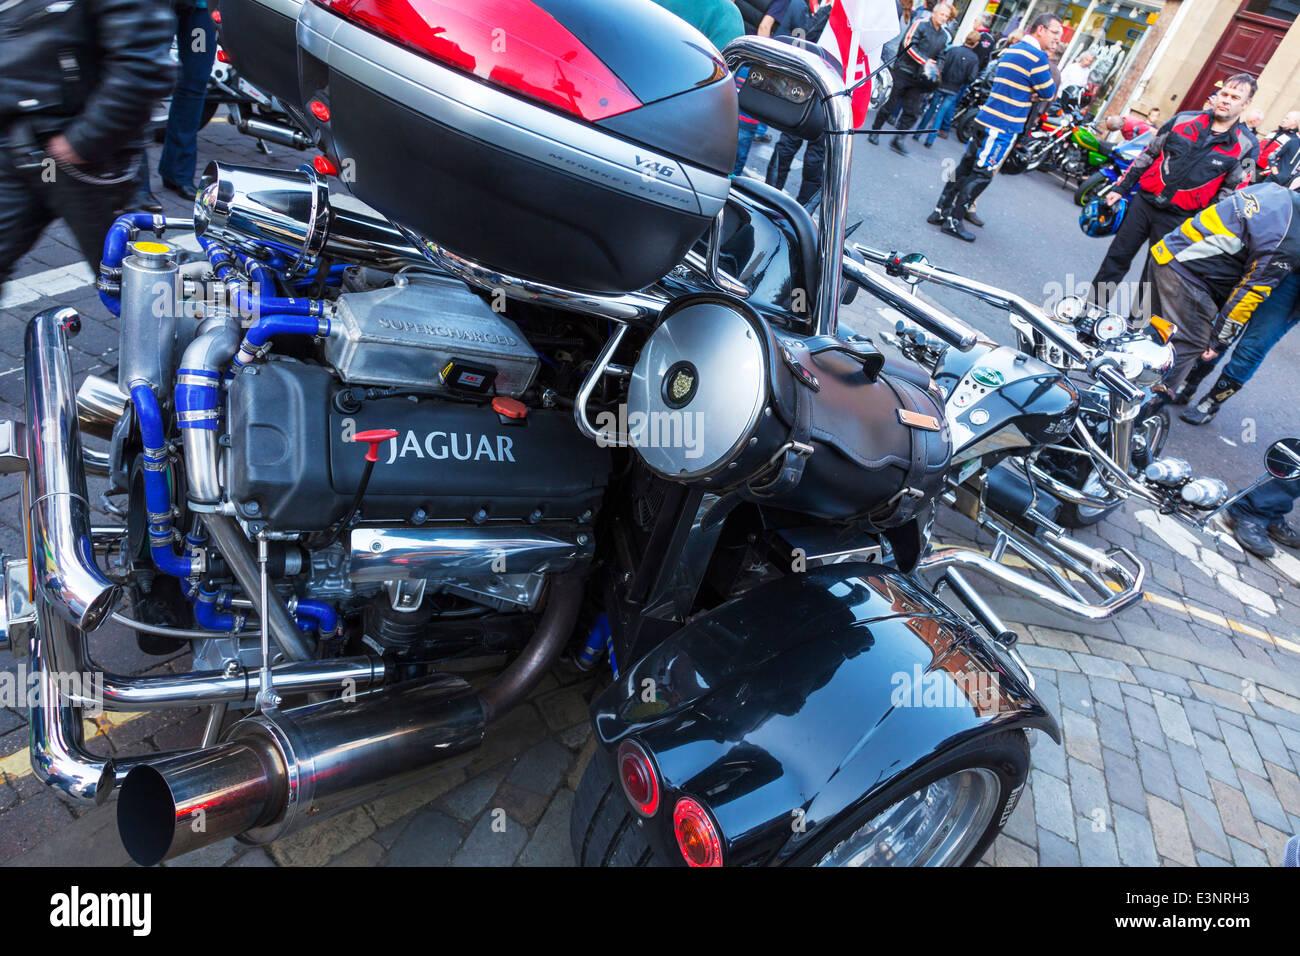 Bike Motor Parts : Jaguar car engine in trike motorbike motorcycle bike